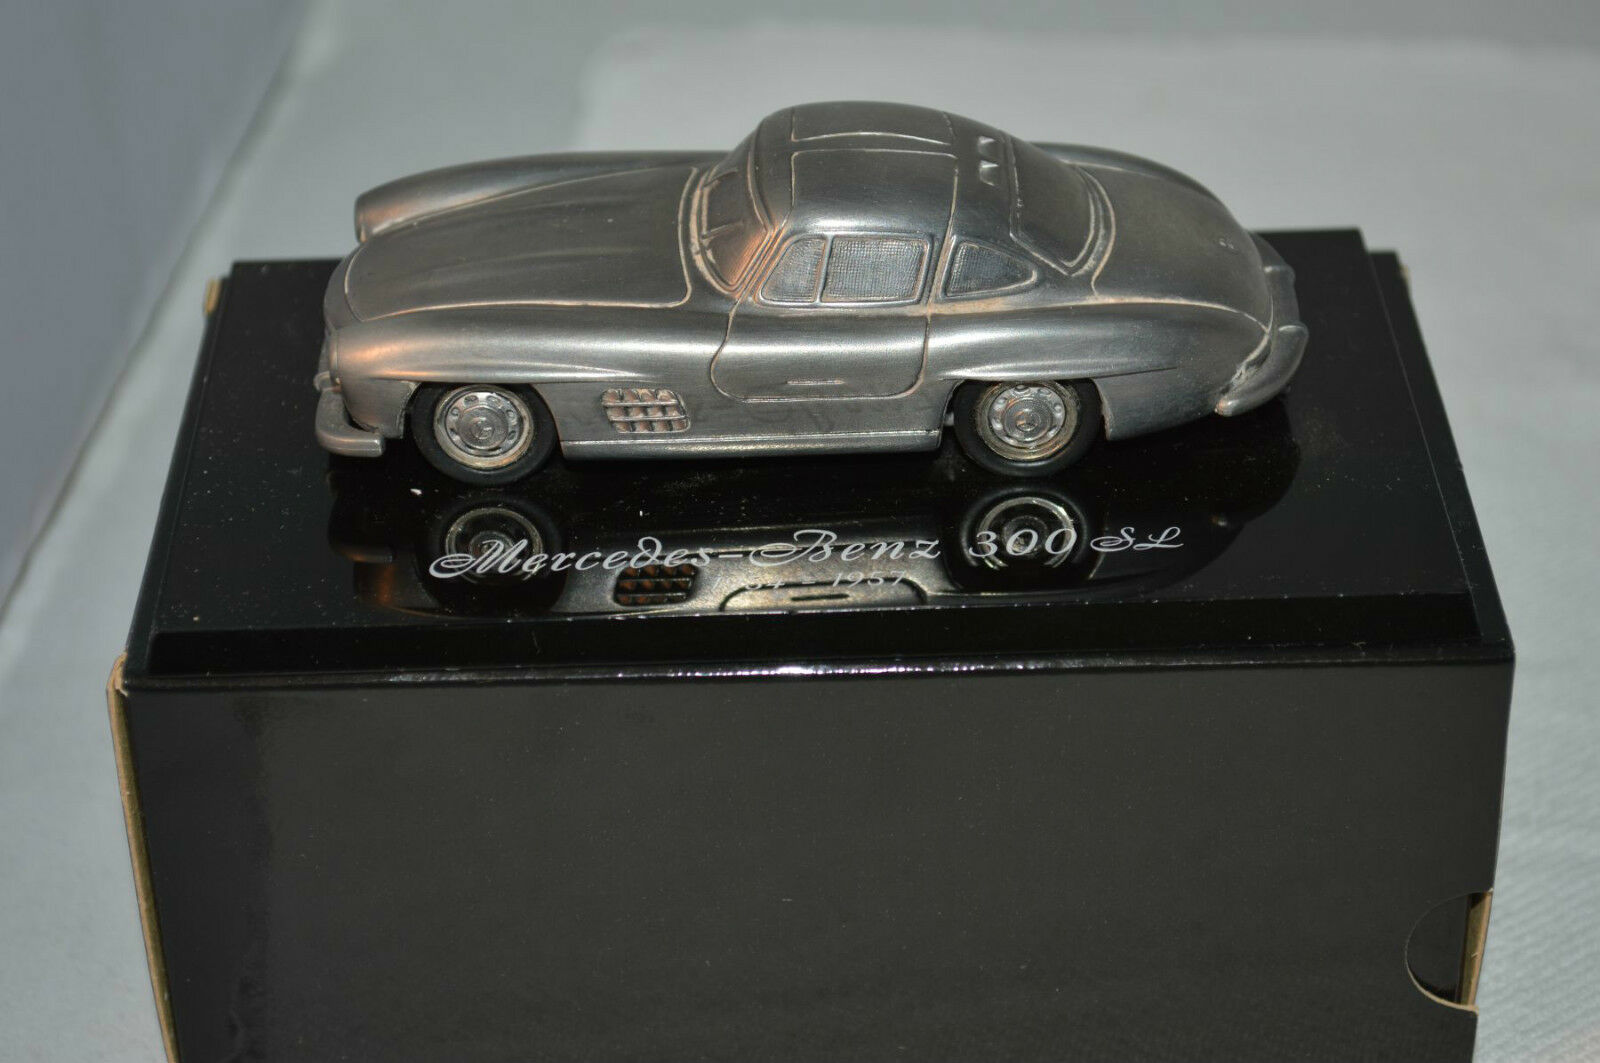 Danhausen Mercedes Benz 300 SL 1954-1957 full metal car limited model very rare